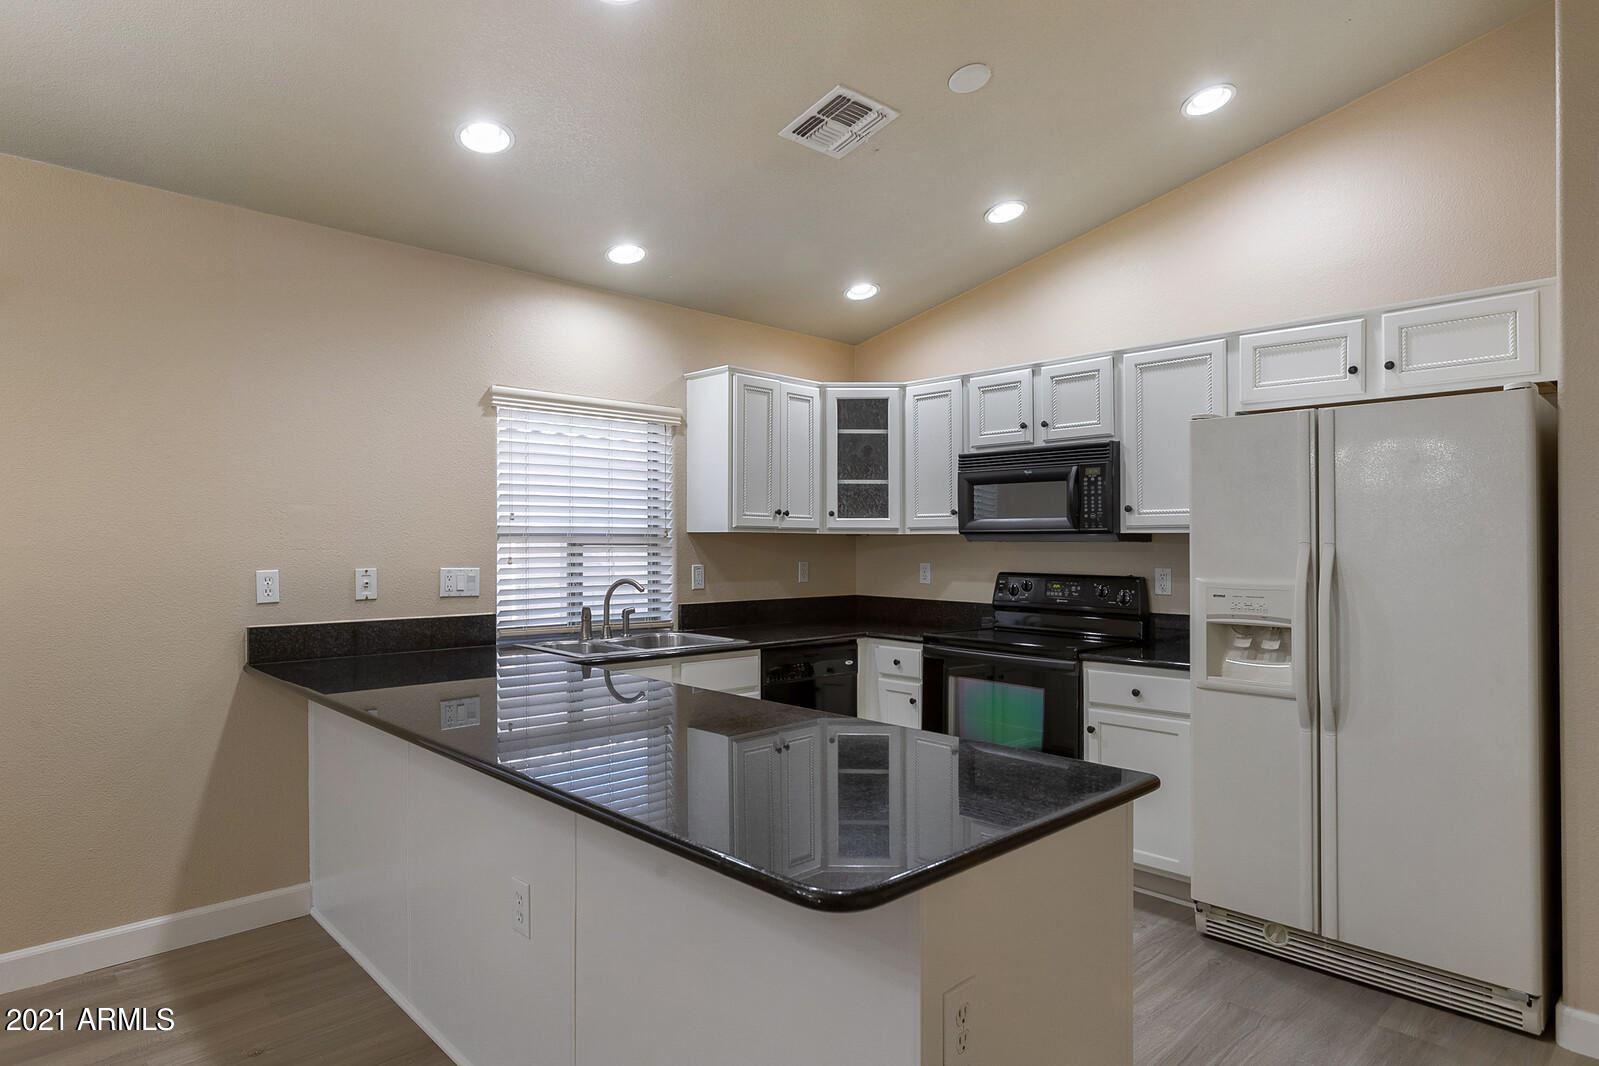 Photo for 42043 W Anne Lane, Maricopa, AZ 85138 (MLS # 6170901)